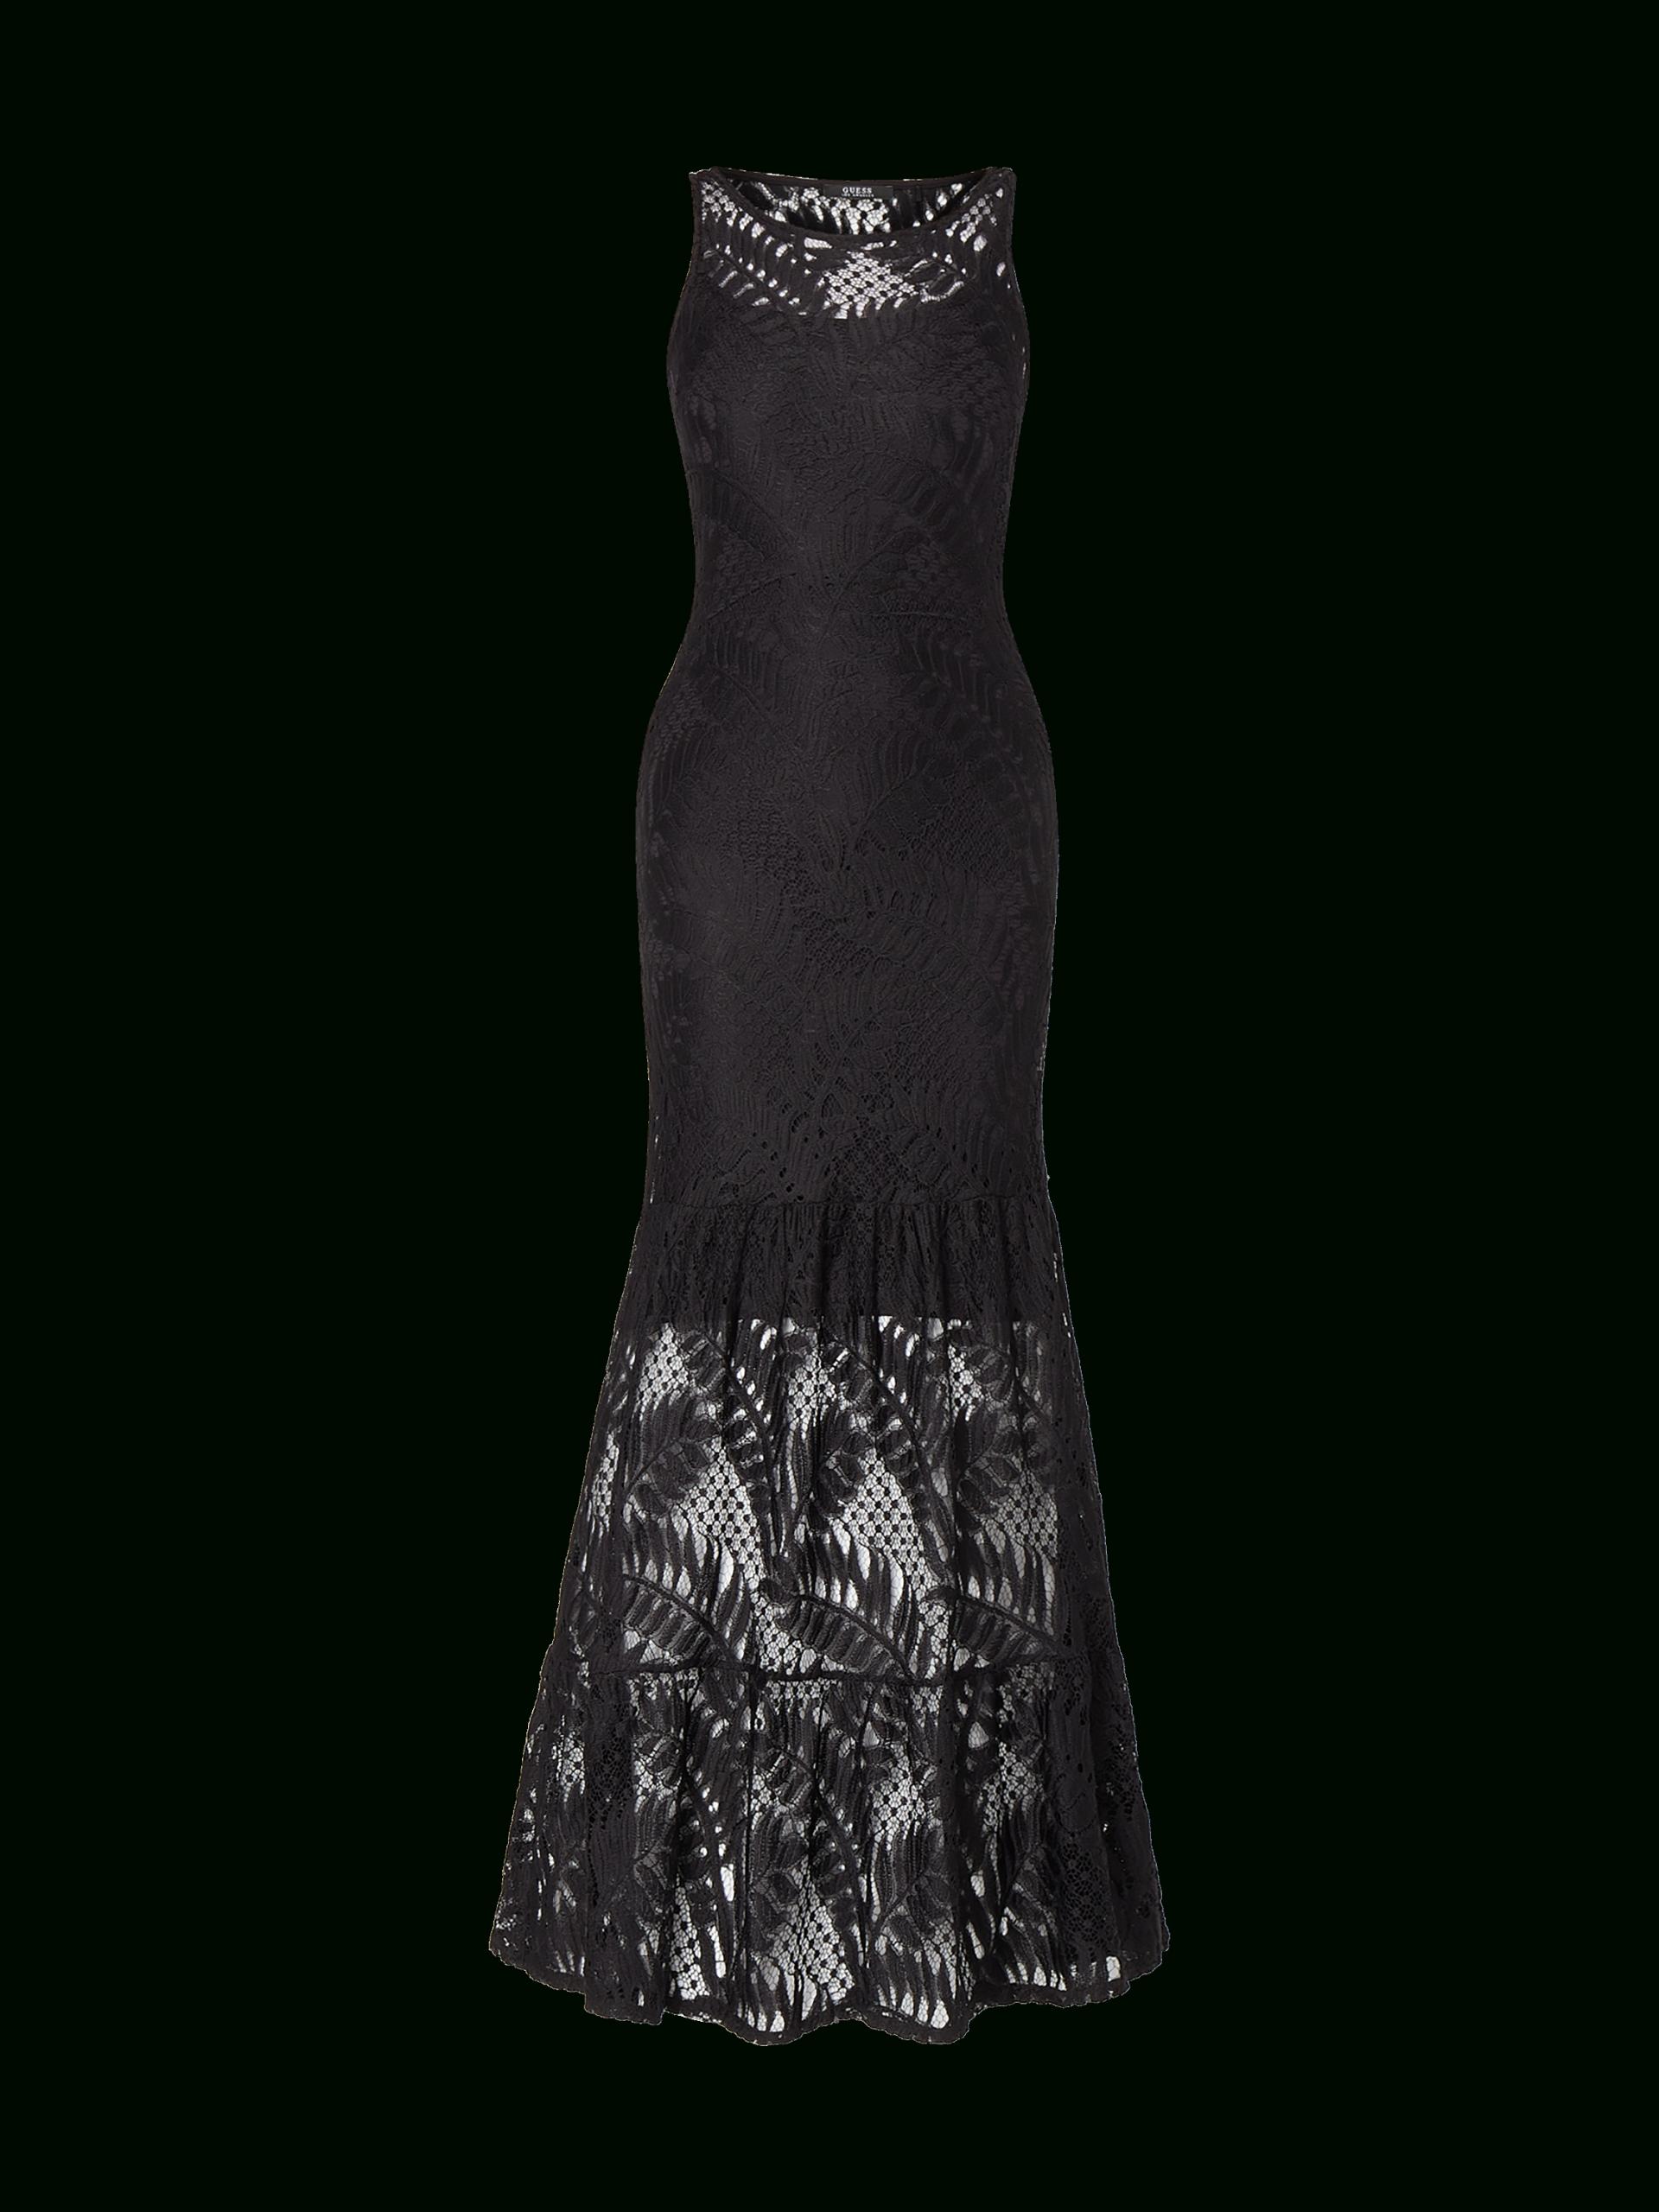 Abend Perfekt Guess Abend Kleid BoutiqueFormal Luxurius Guess Abend Kleid Design